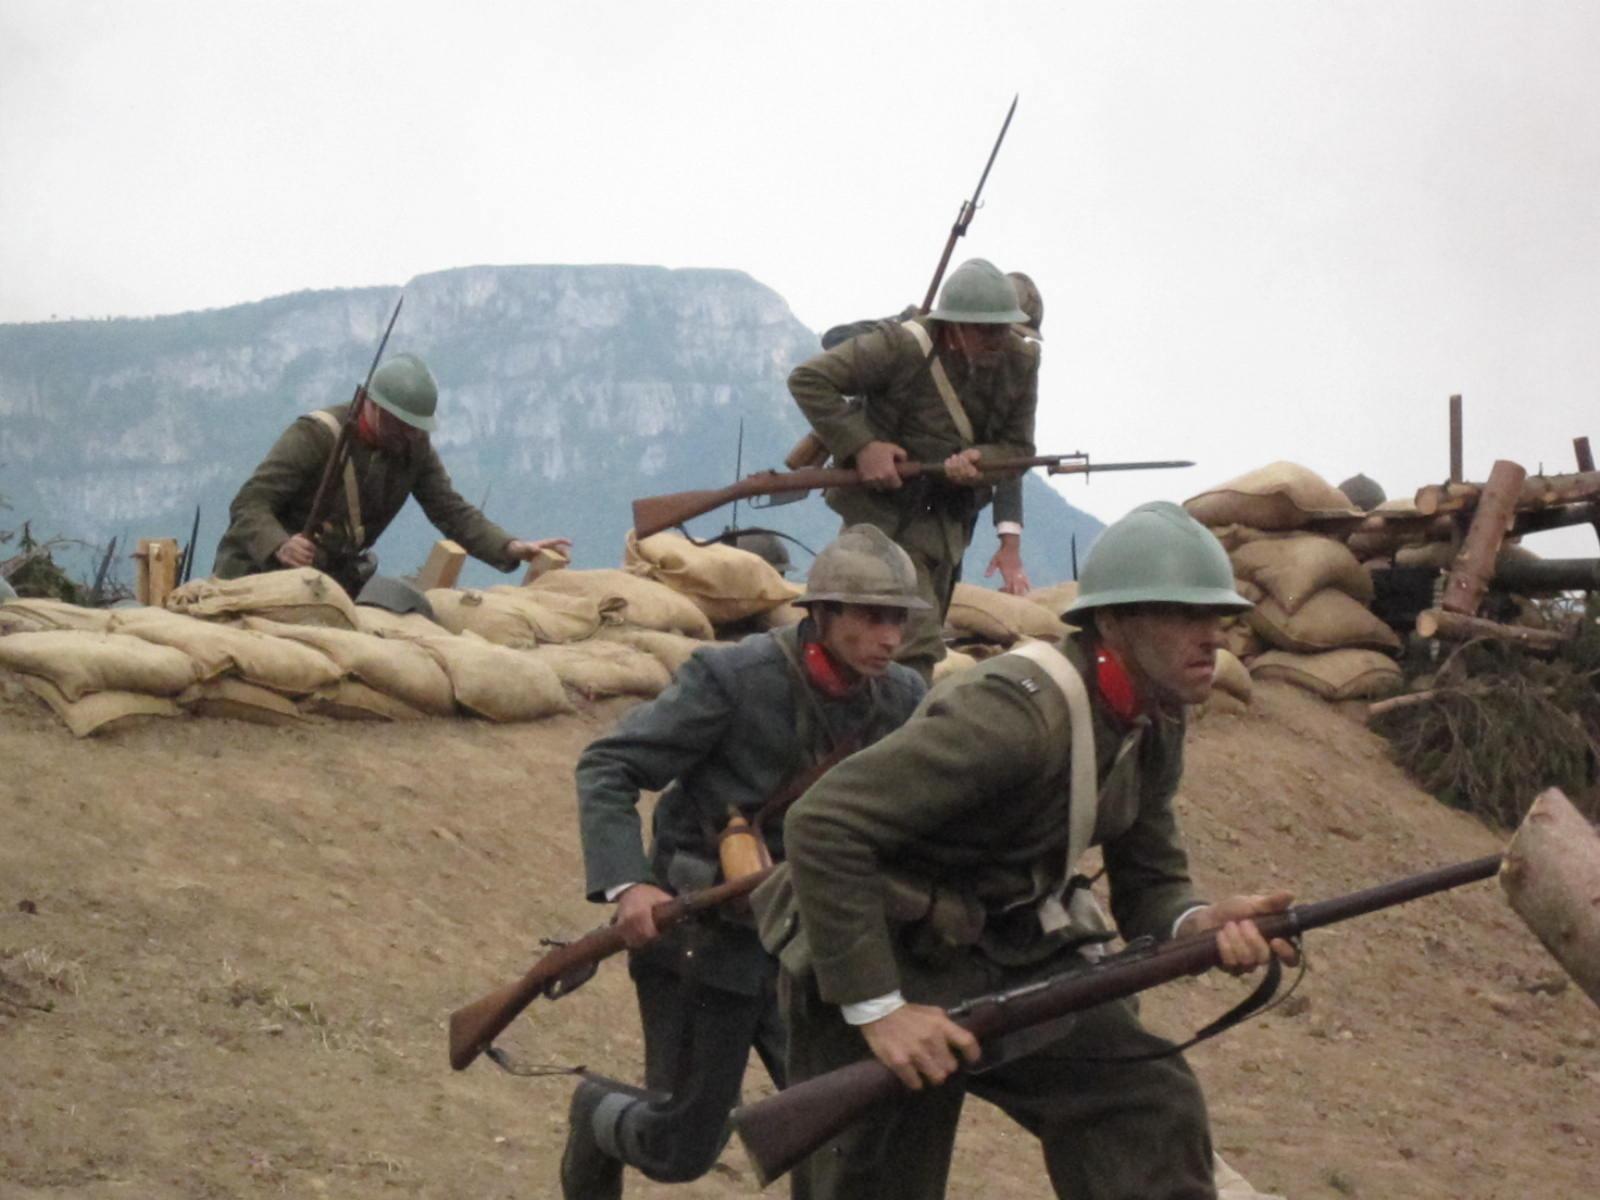 Fango e Gloria: una scena di guerra tratta dal film